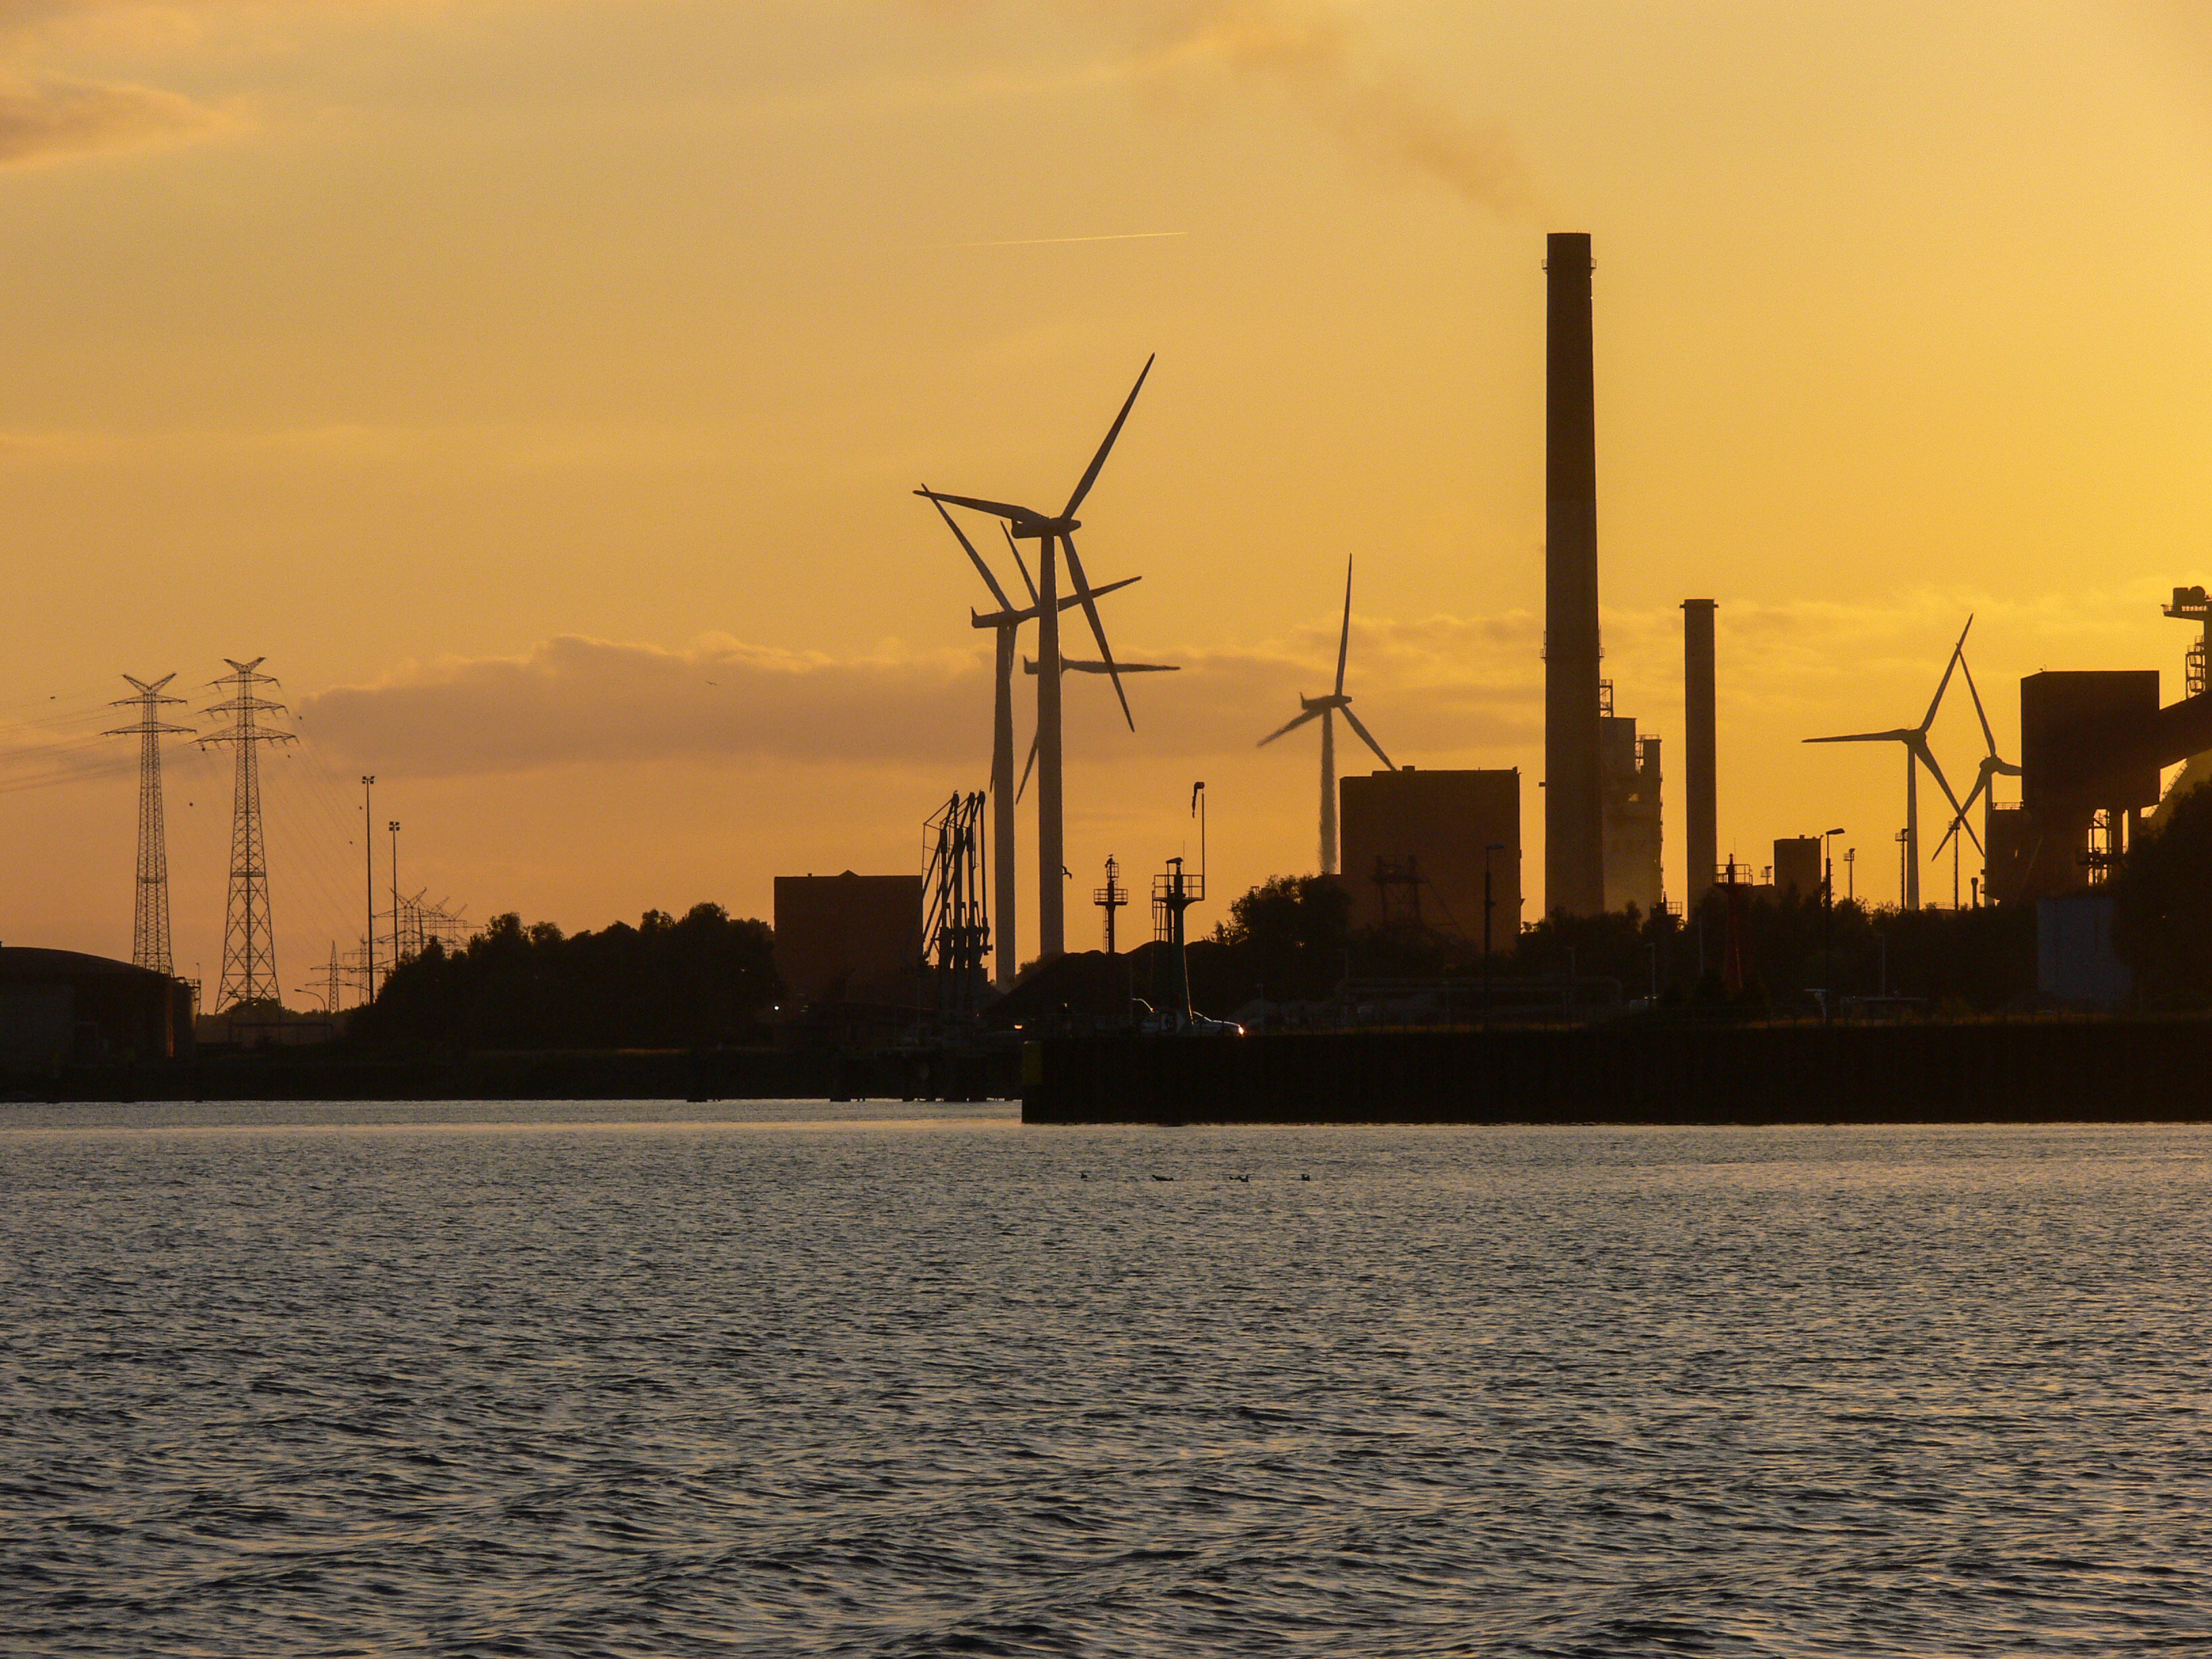 Industrie an der Weser (Bild: Der Weg)